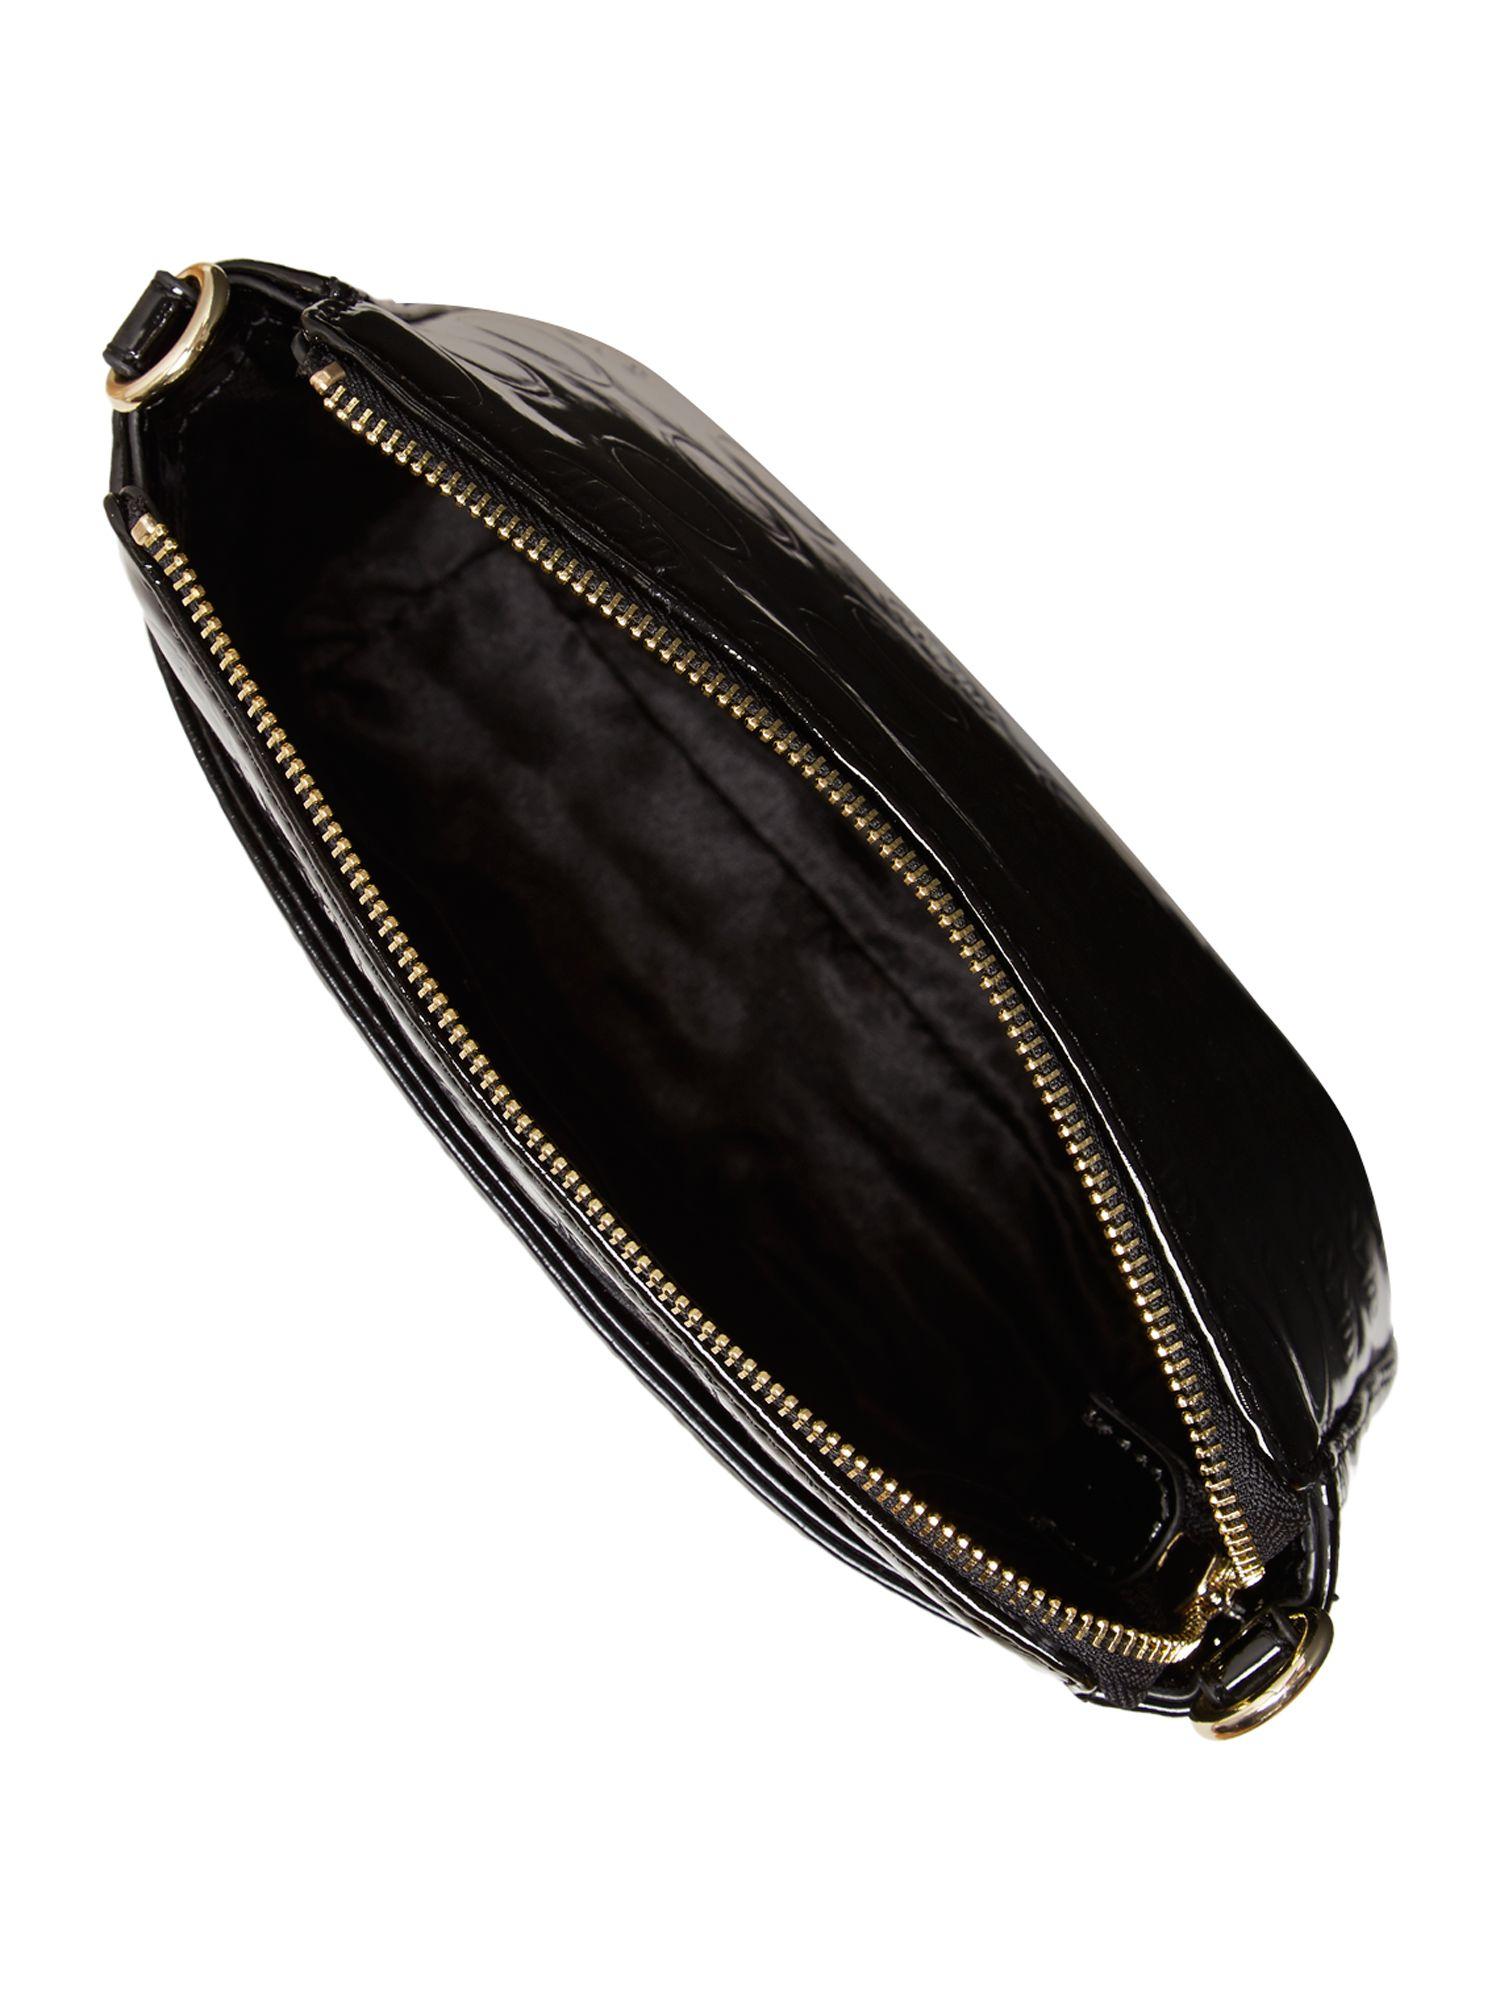 DKNY Patent Coin Black Cross Body Bag